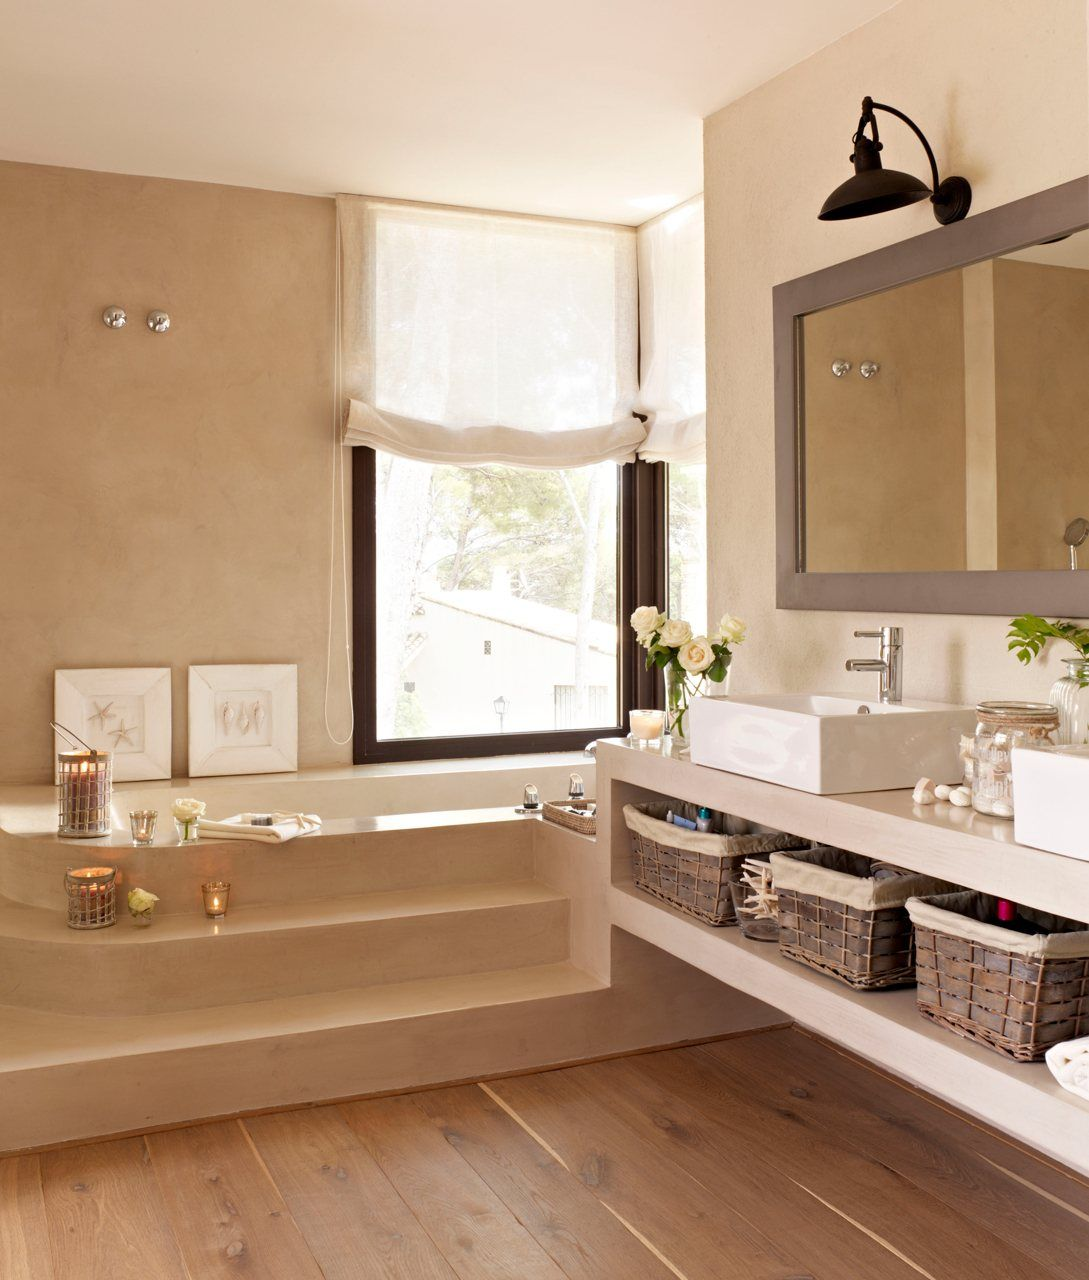 Ba o actual zalo sin gastar mucho bathroom koupelna for Pared de bano de concreto encerado